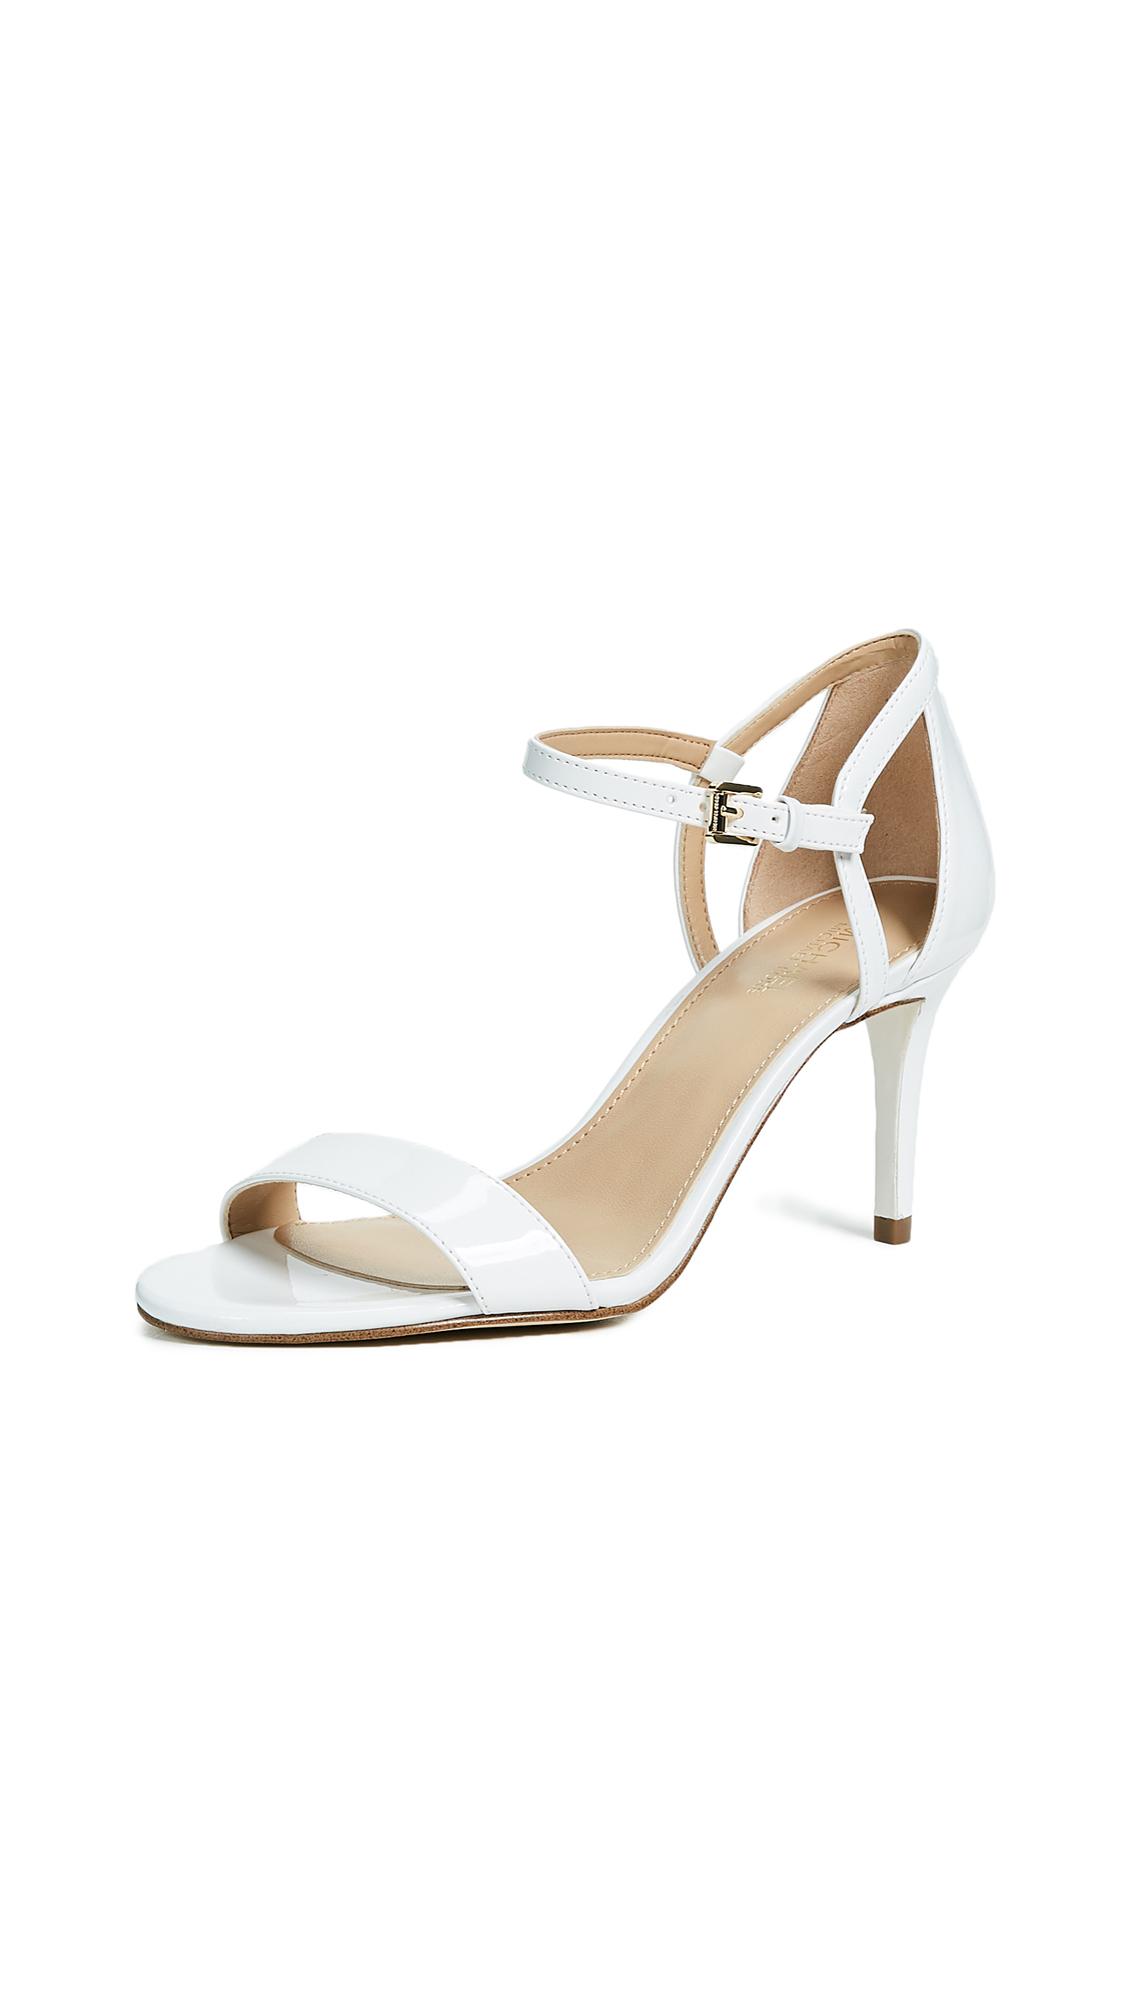 MICHAEL Michael Kors Simone Mid Sandals - Optic White